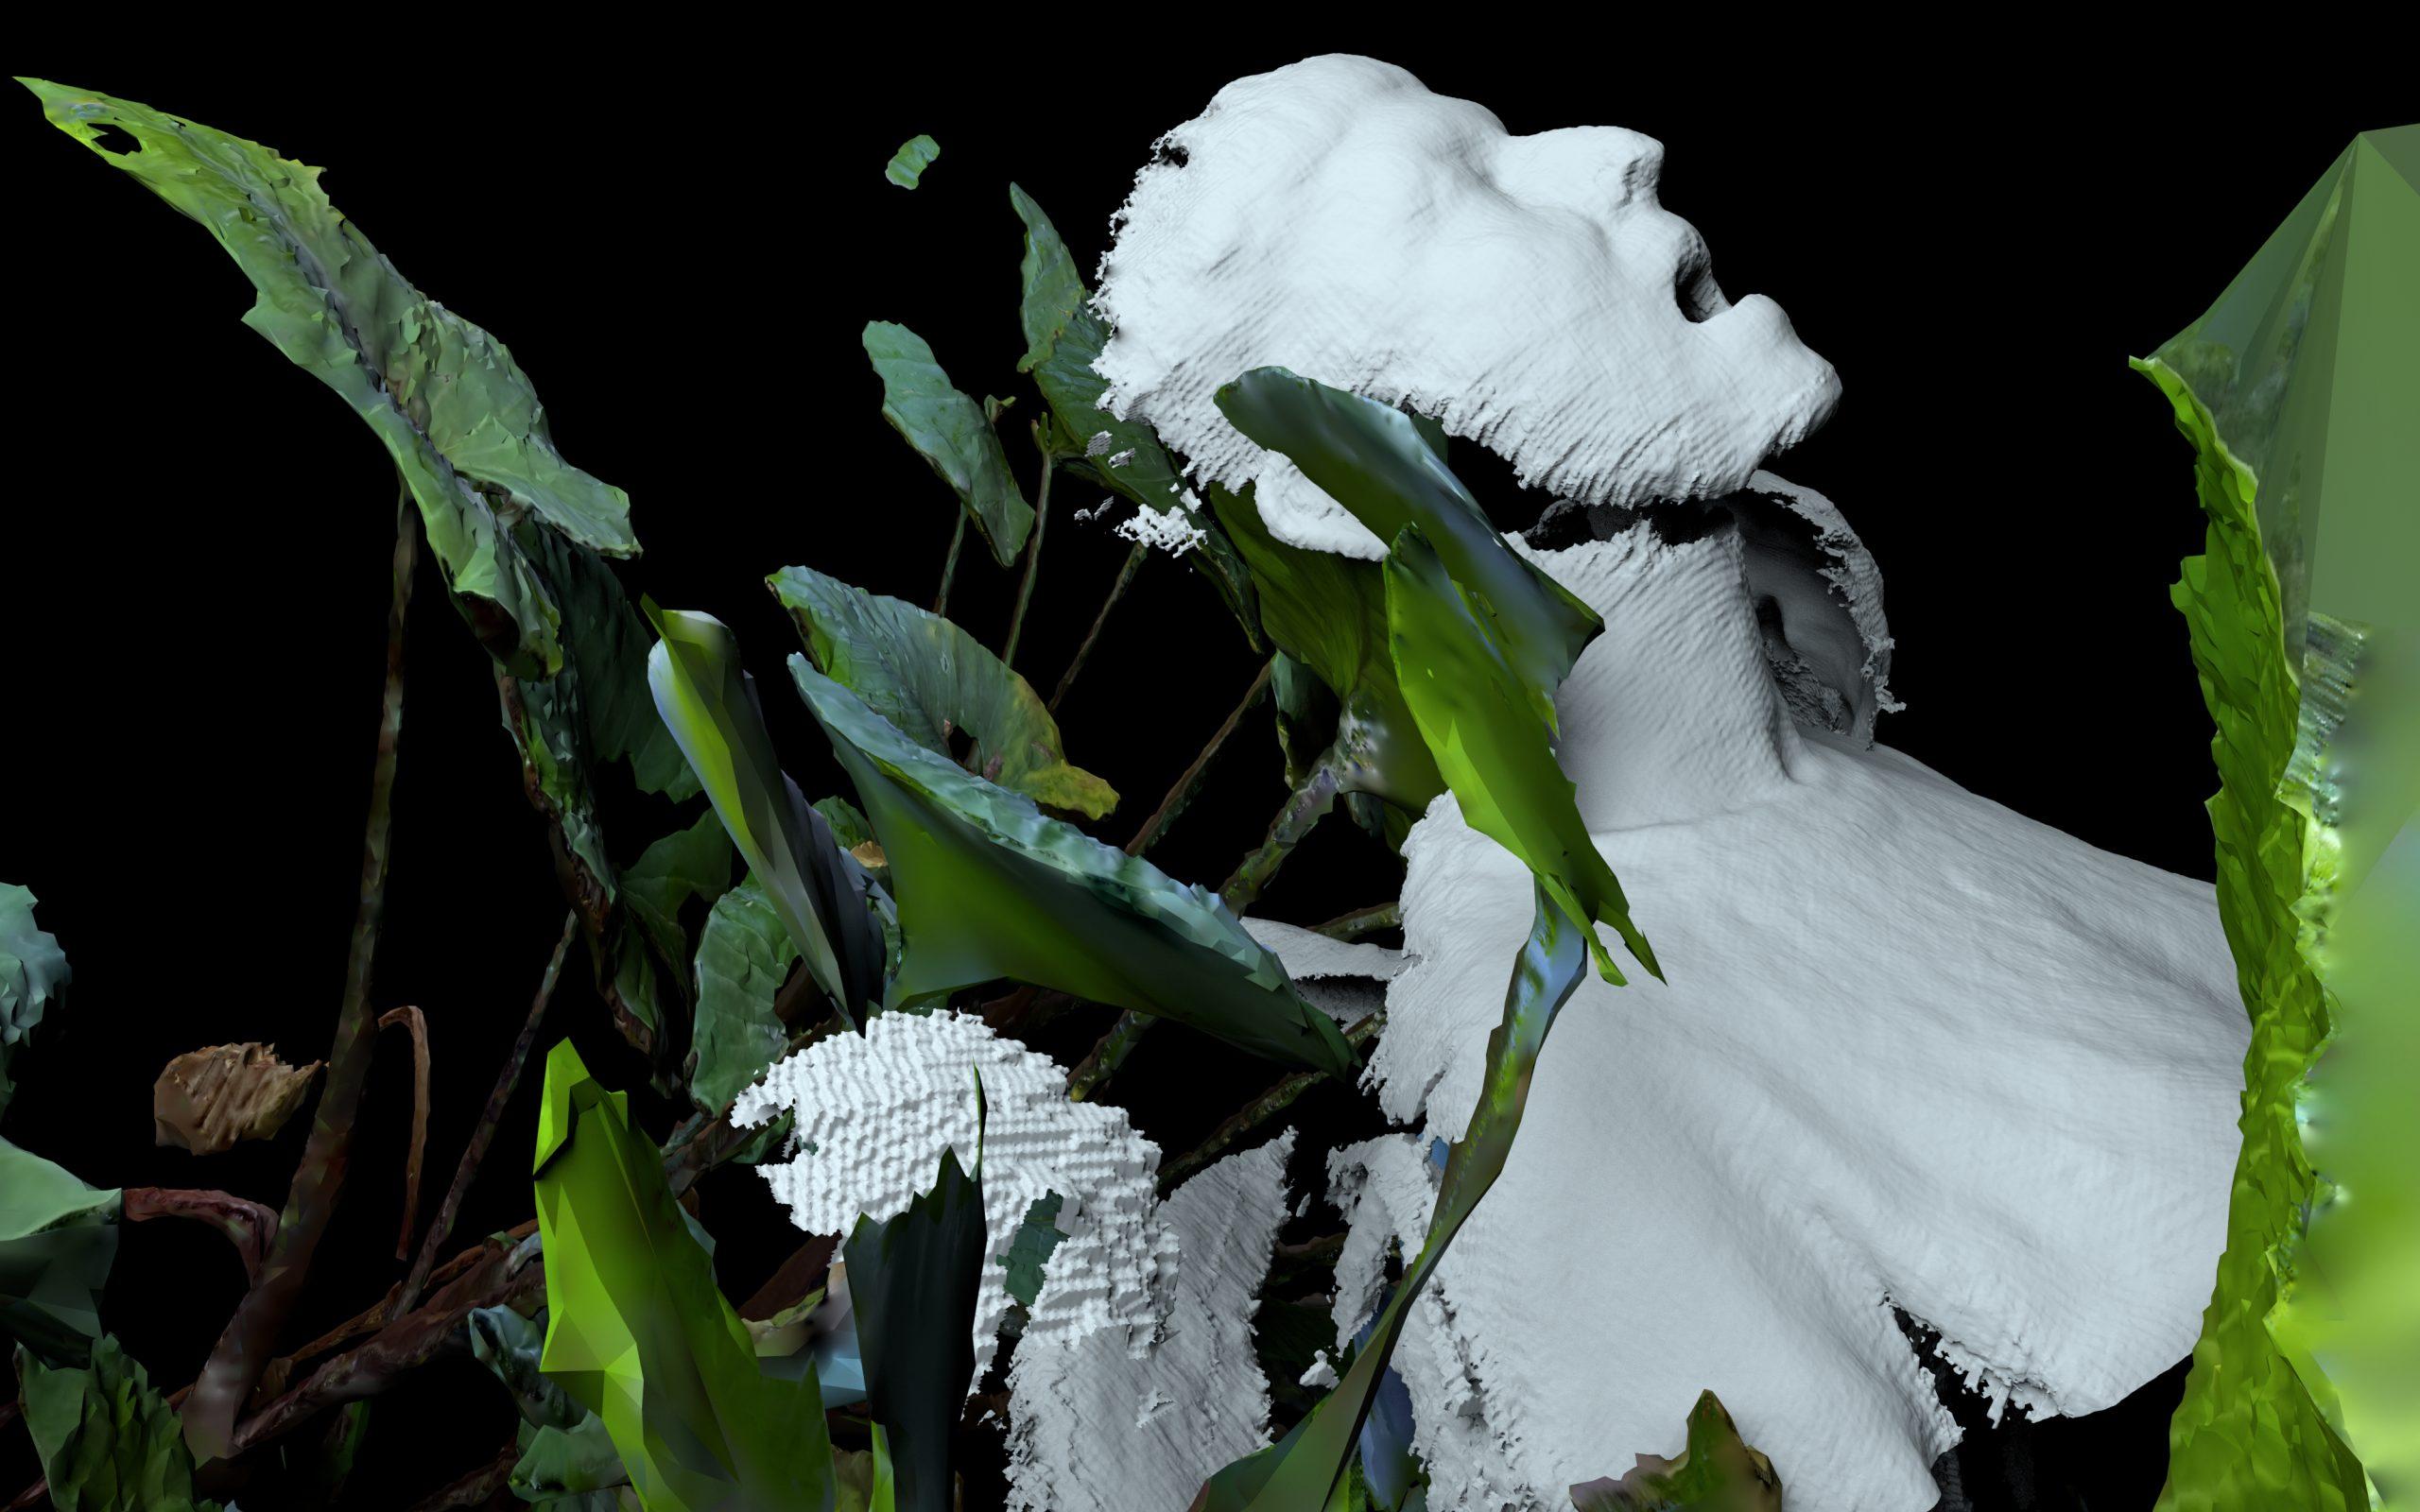 Yandell Walton, 3D rendered still imagery in development using photogrammetry, 2020. Image courtesy the artist.